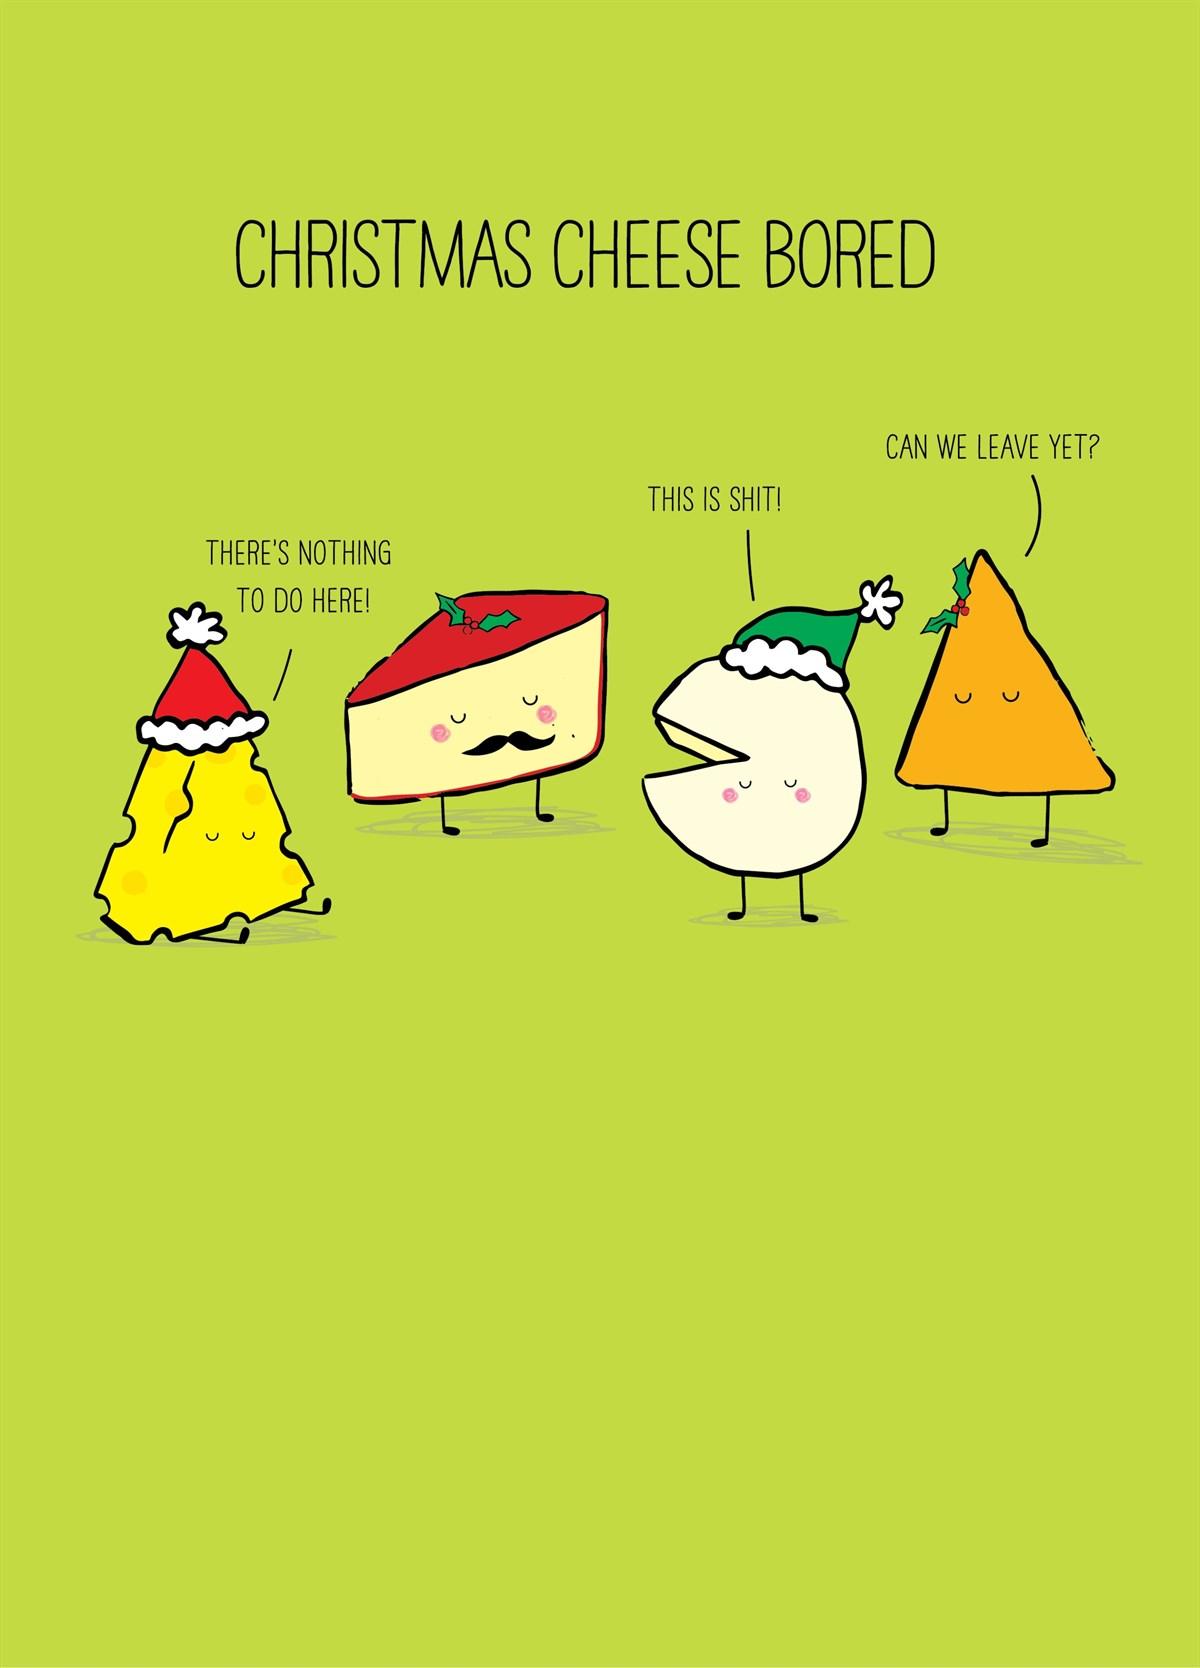 Christmas Cheese Puns.Christmas Cheese Bored